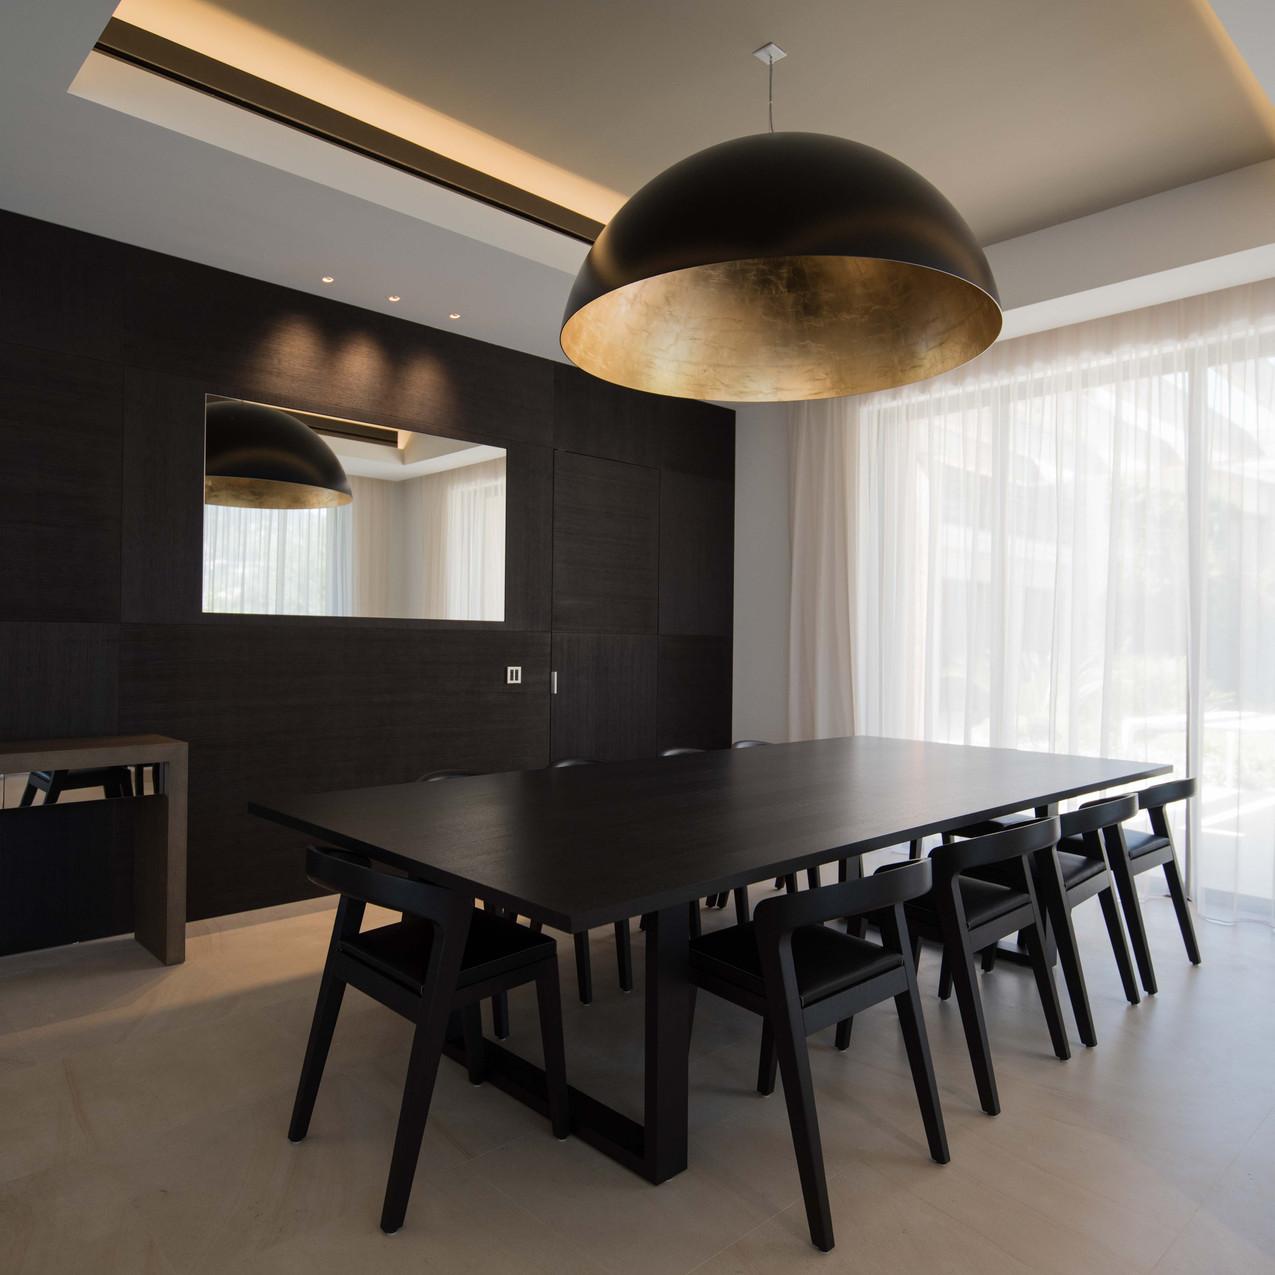 photographe architecture nice france french riviera paca cote dazur interieur-63